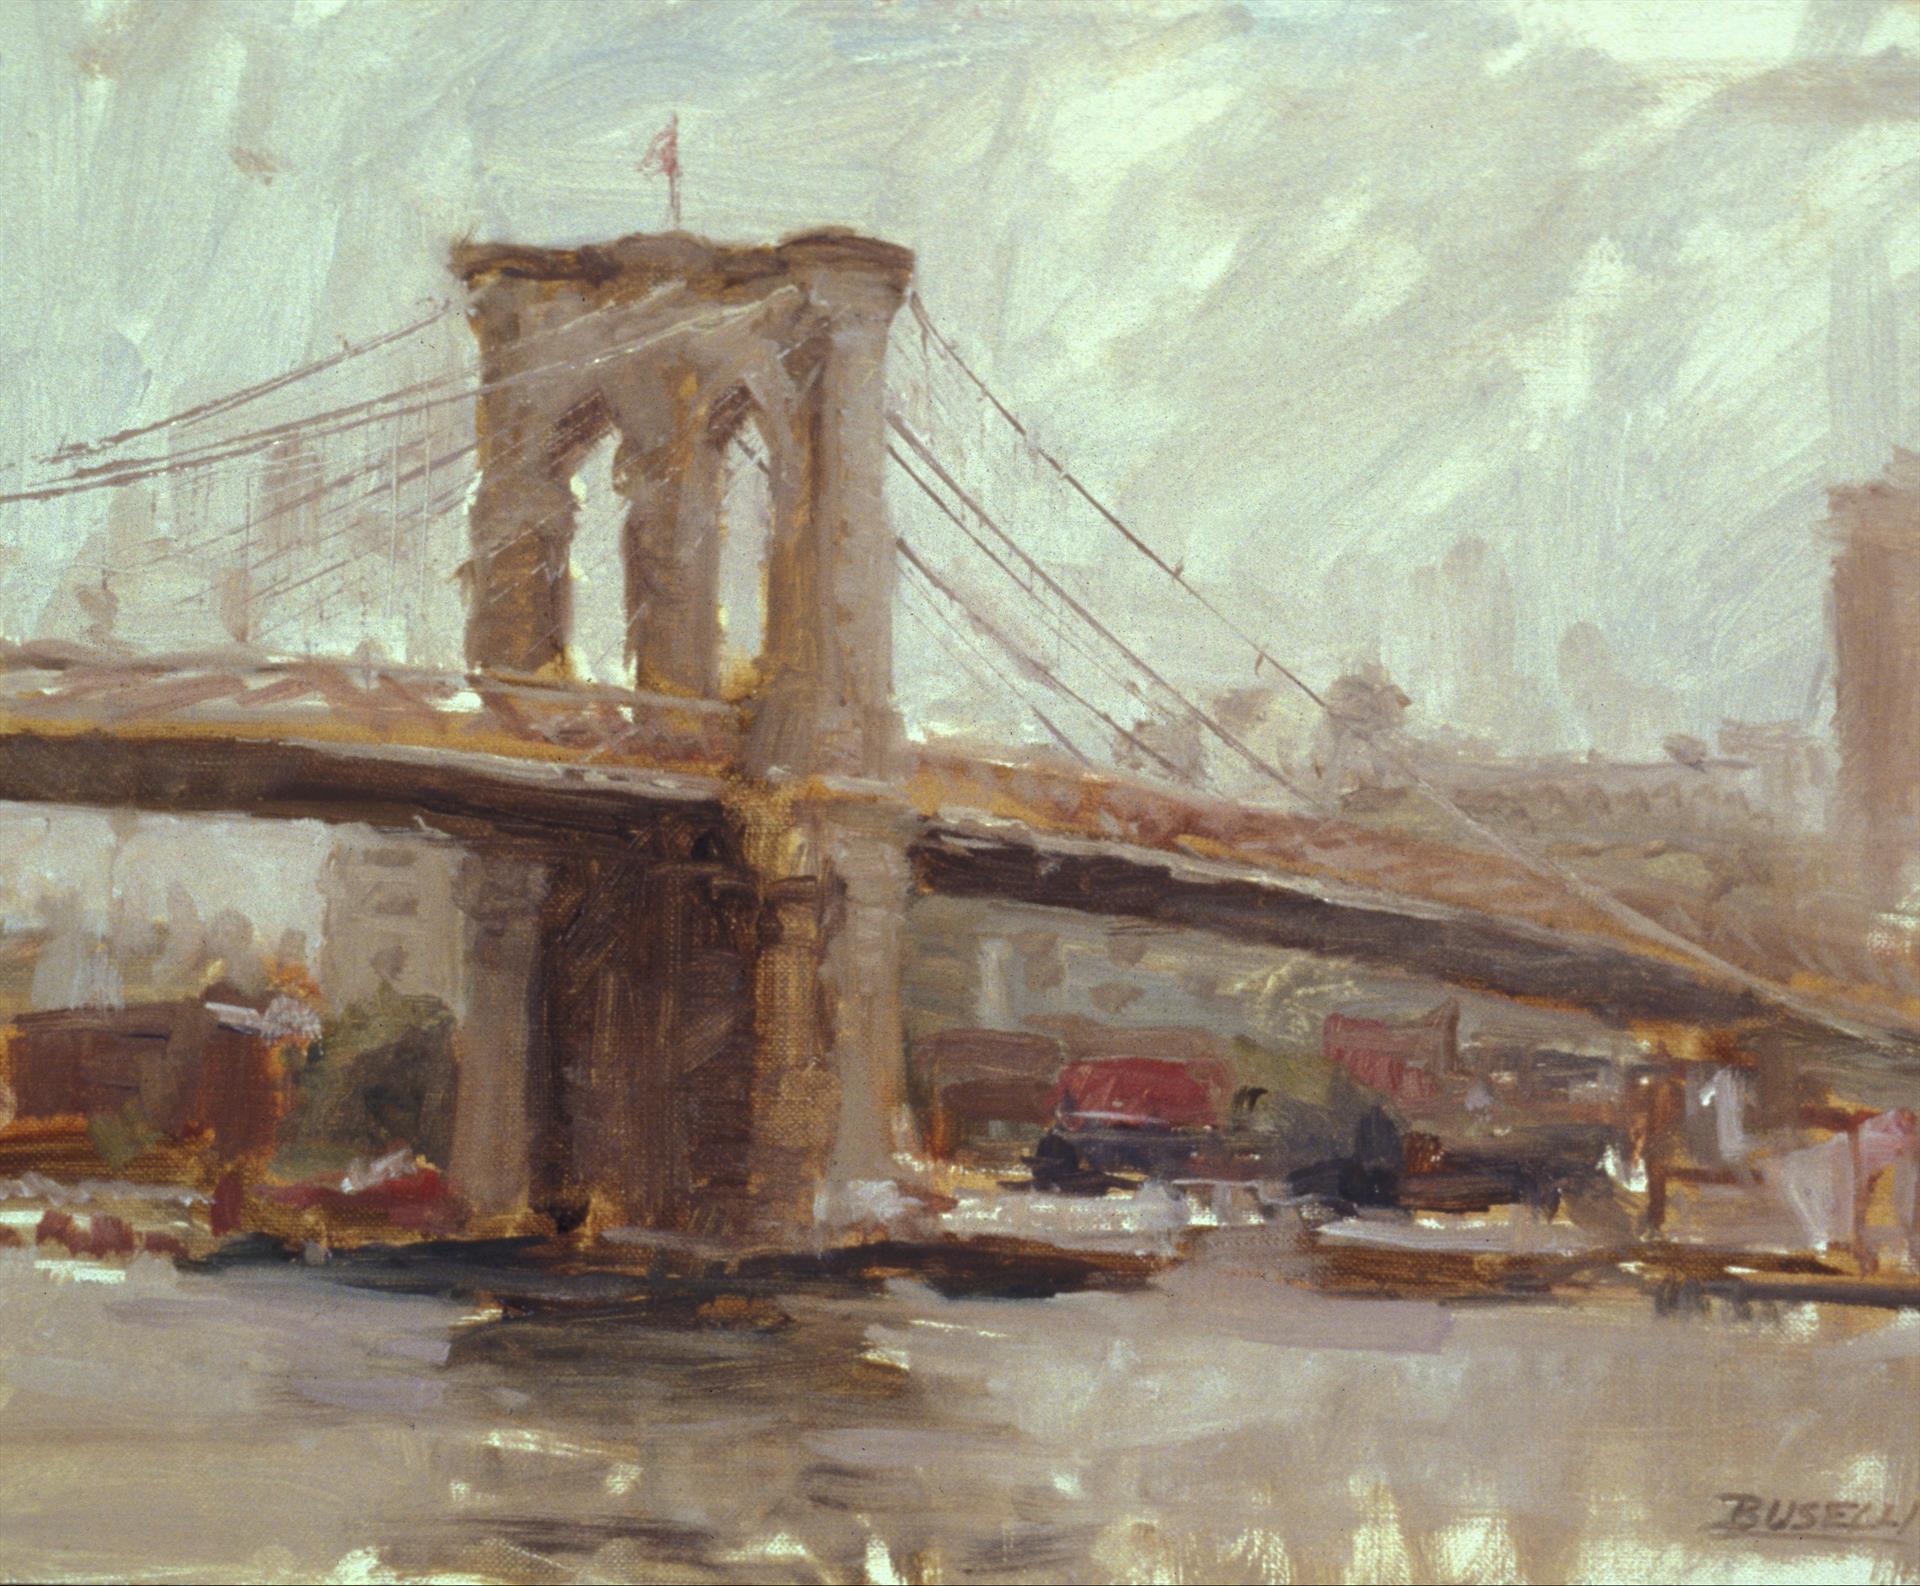 1920x522017175141The_Brooklyn_Bridge_-_9_X_12_-_oil_on_linen_-_Ellen_Buselli.jpg